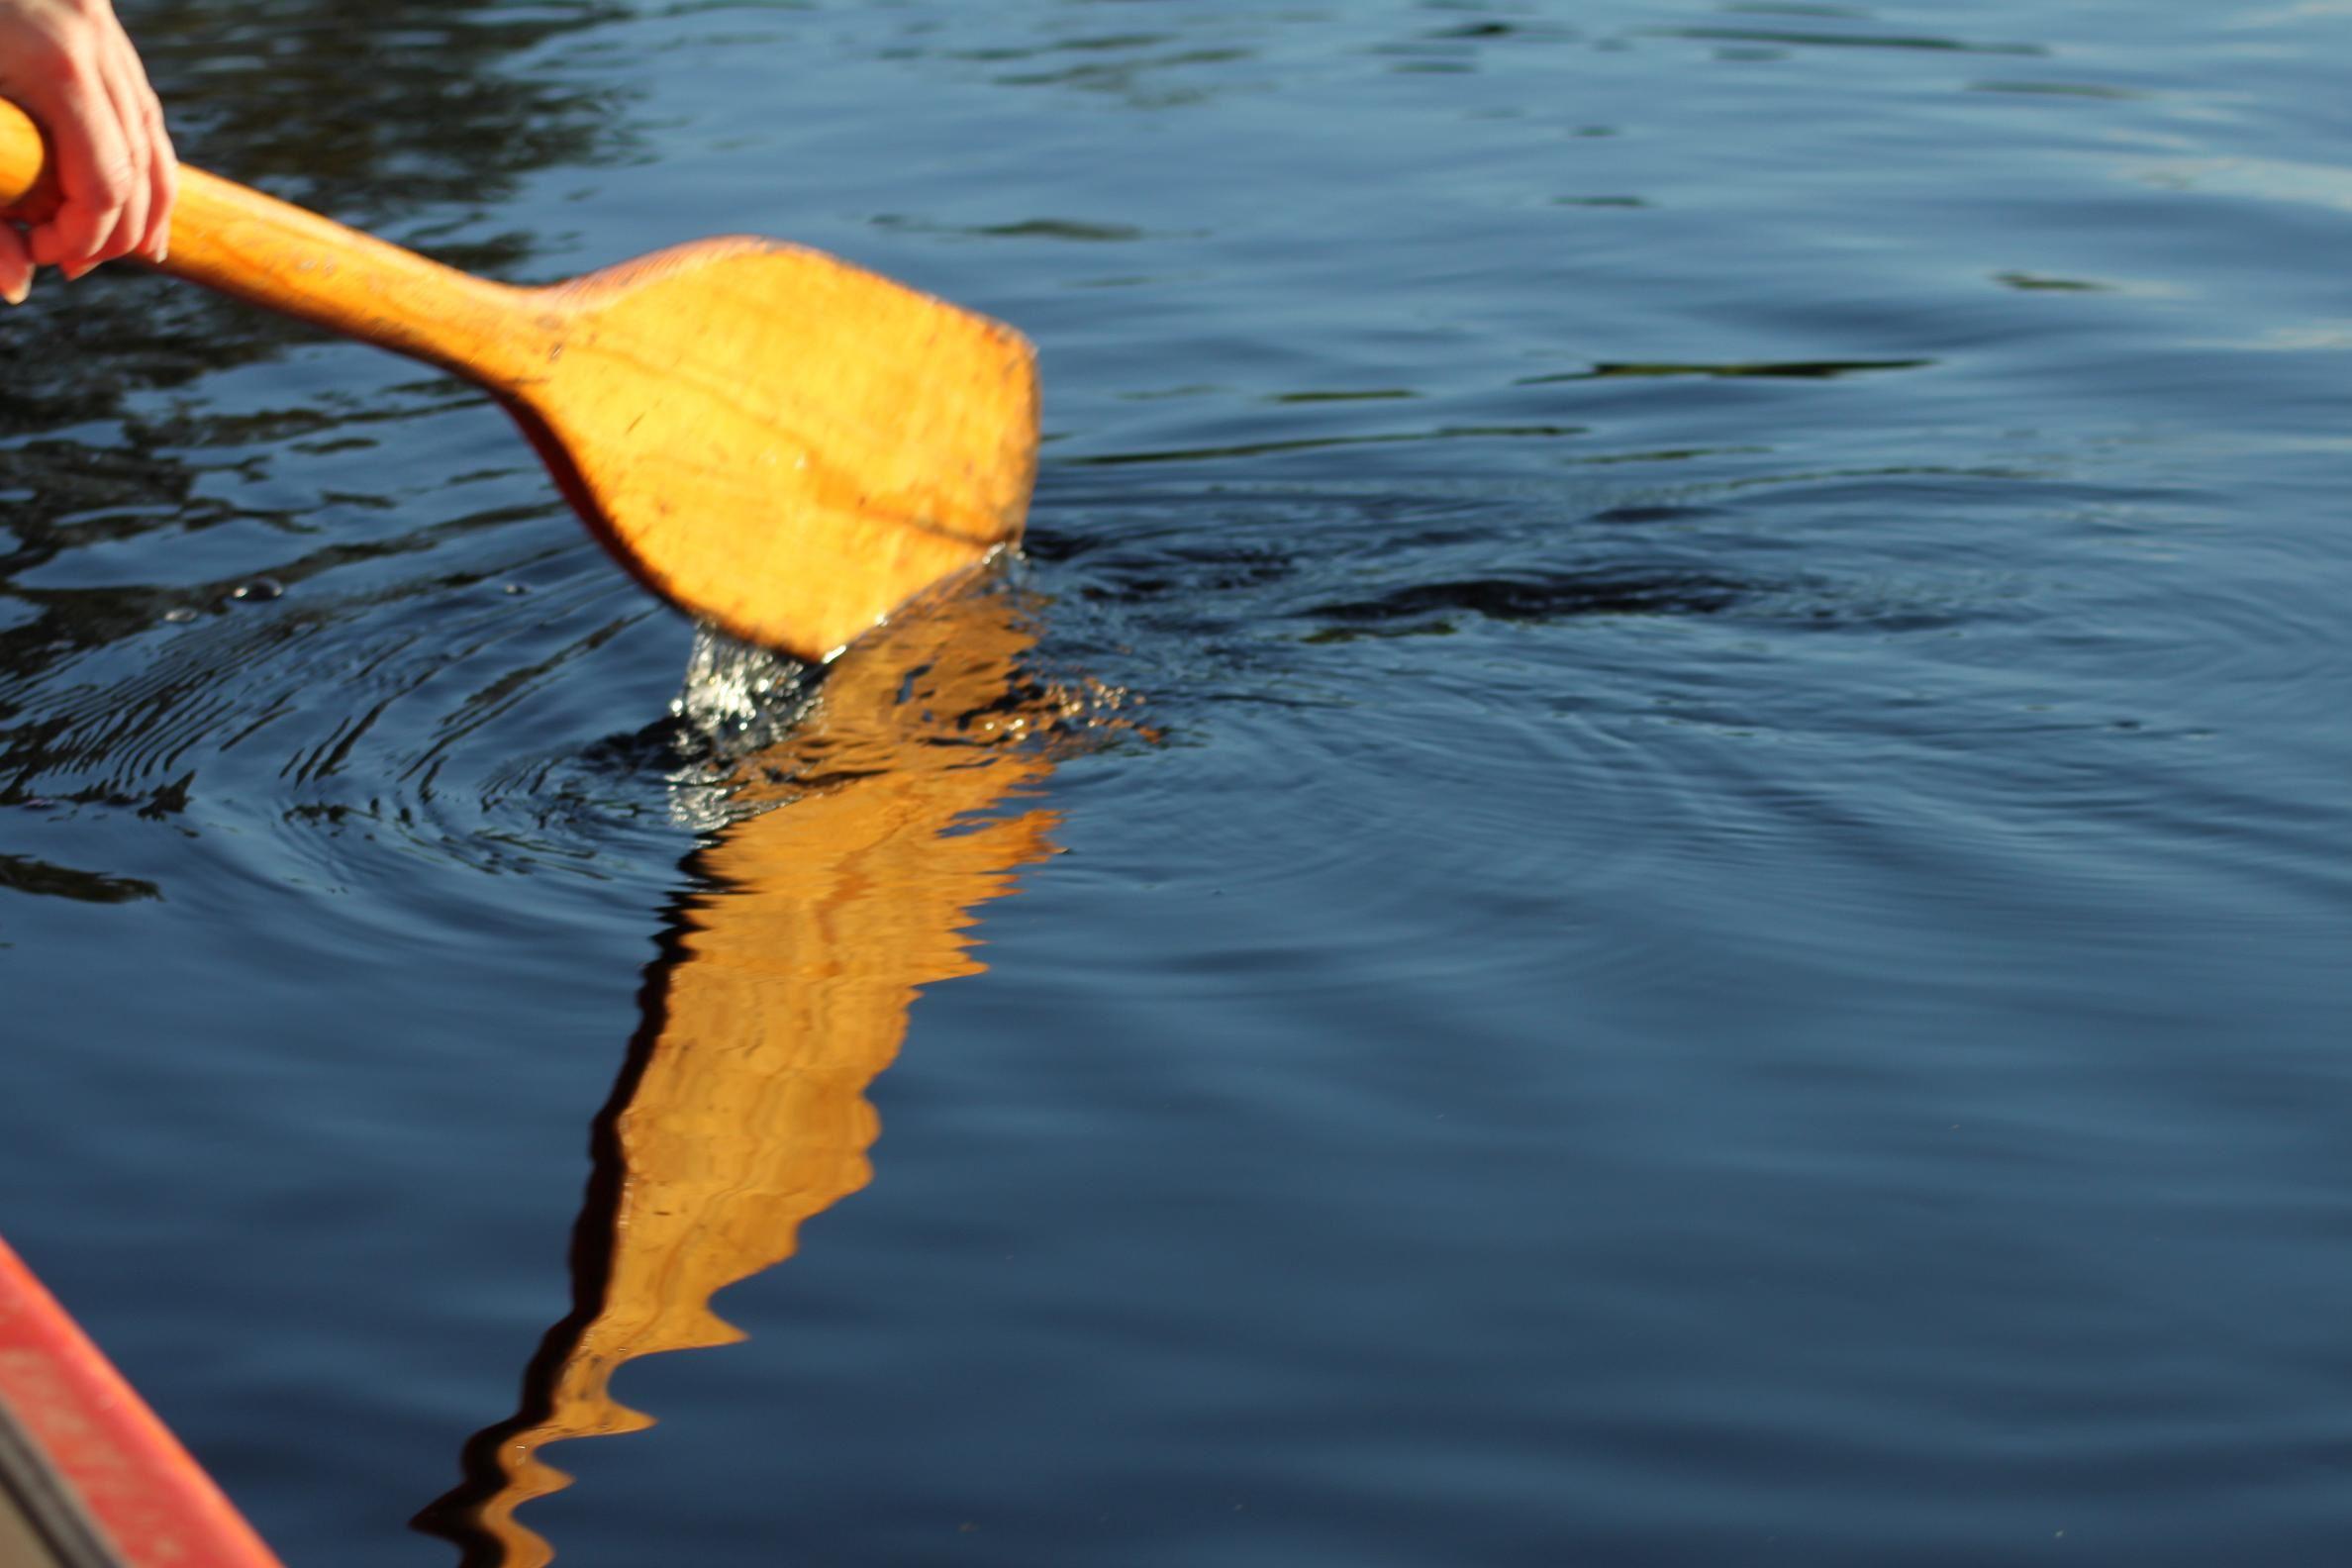 Malungs Turistbyrå, Öje canoe rental